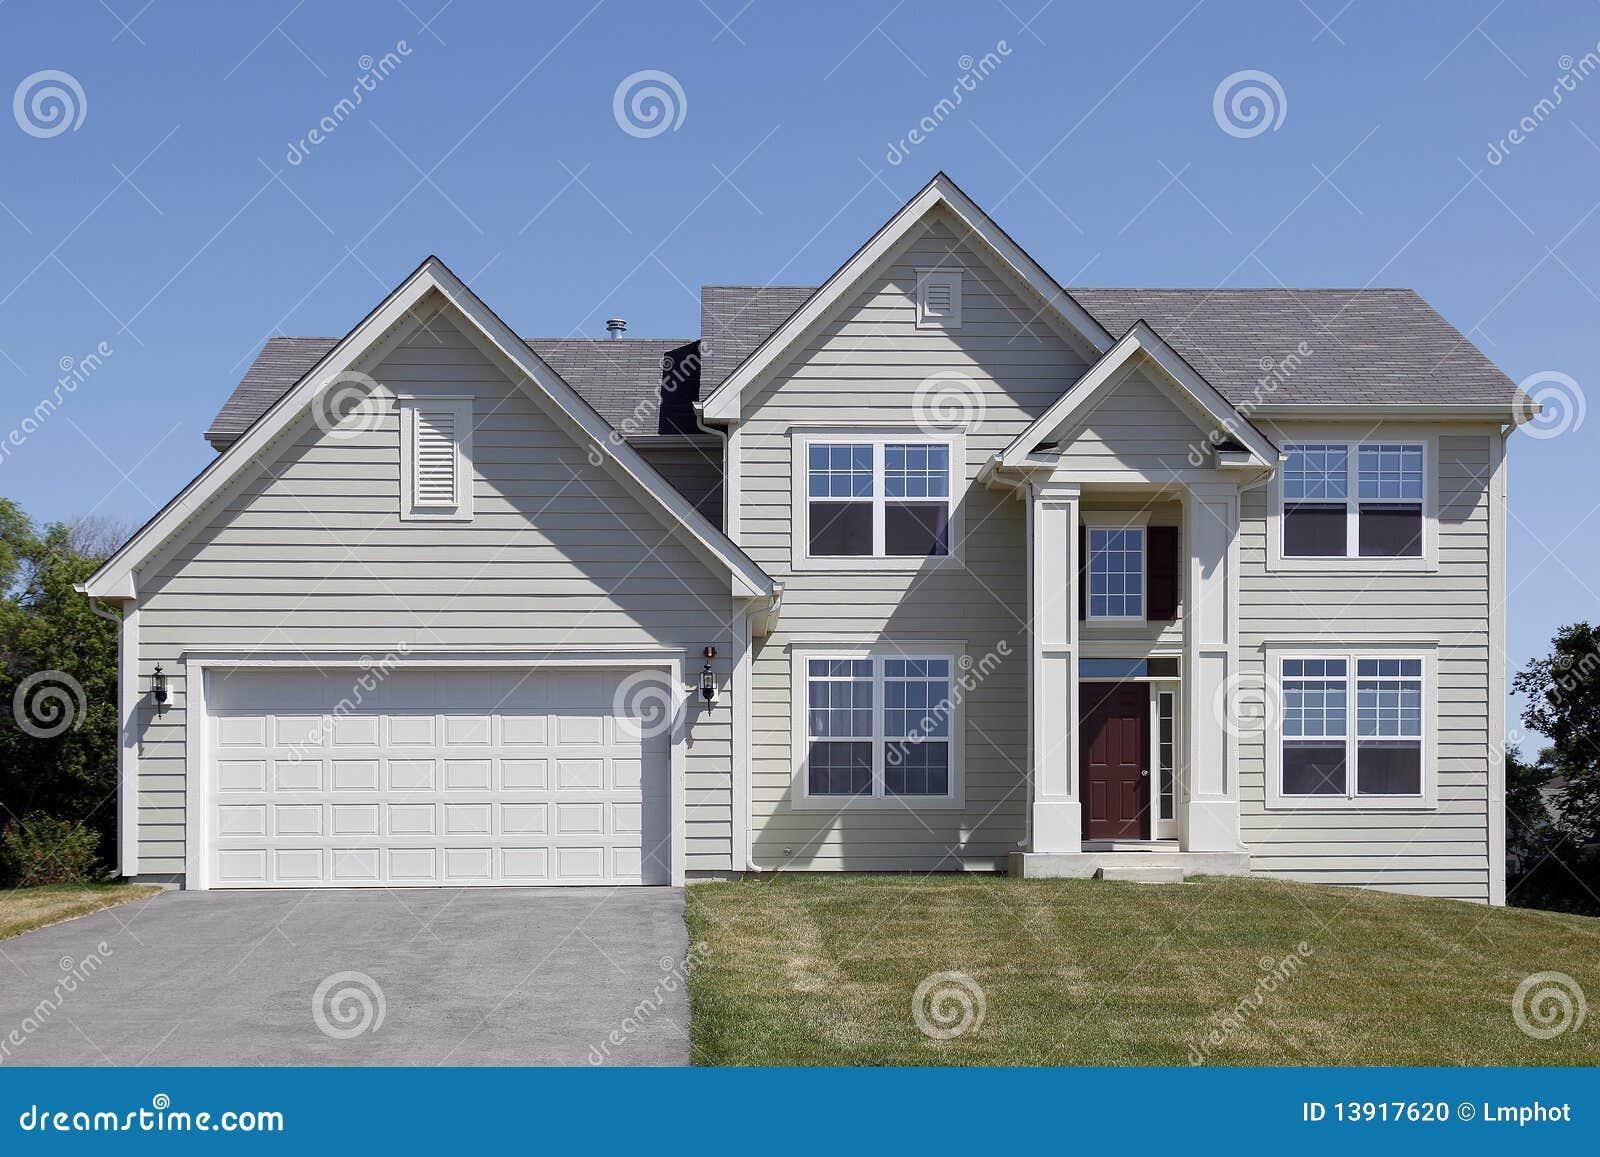 Huis met overspannen ingang stock foto afbeelding 13917620 - Ingang huis idee ...